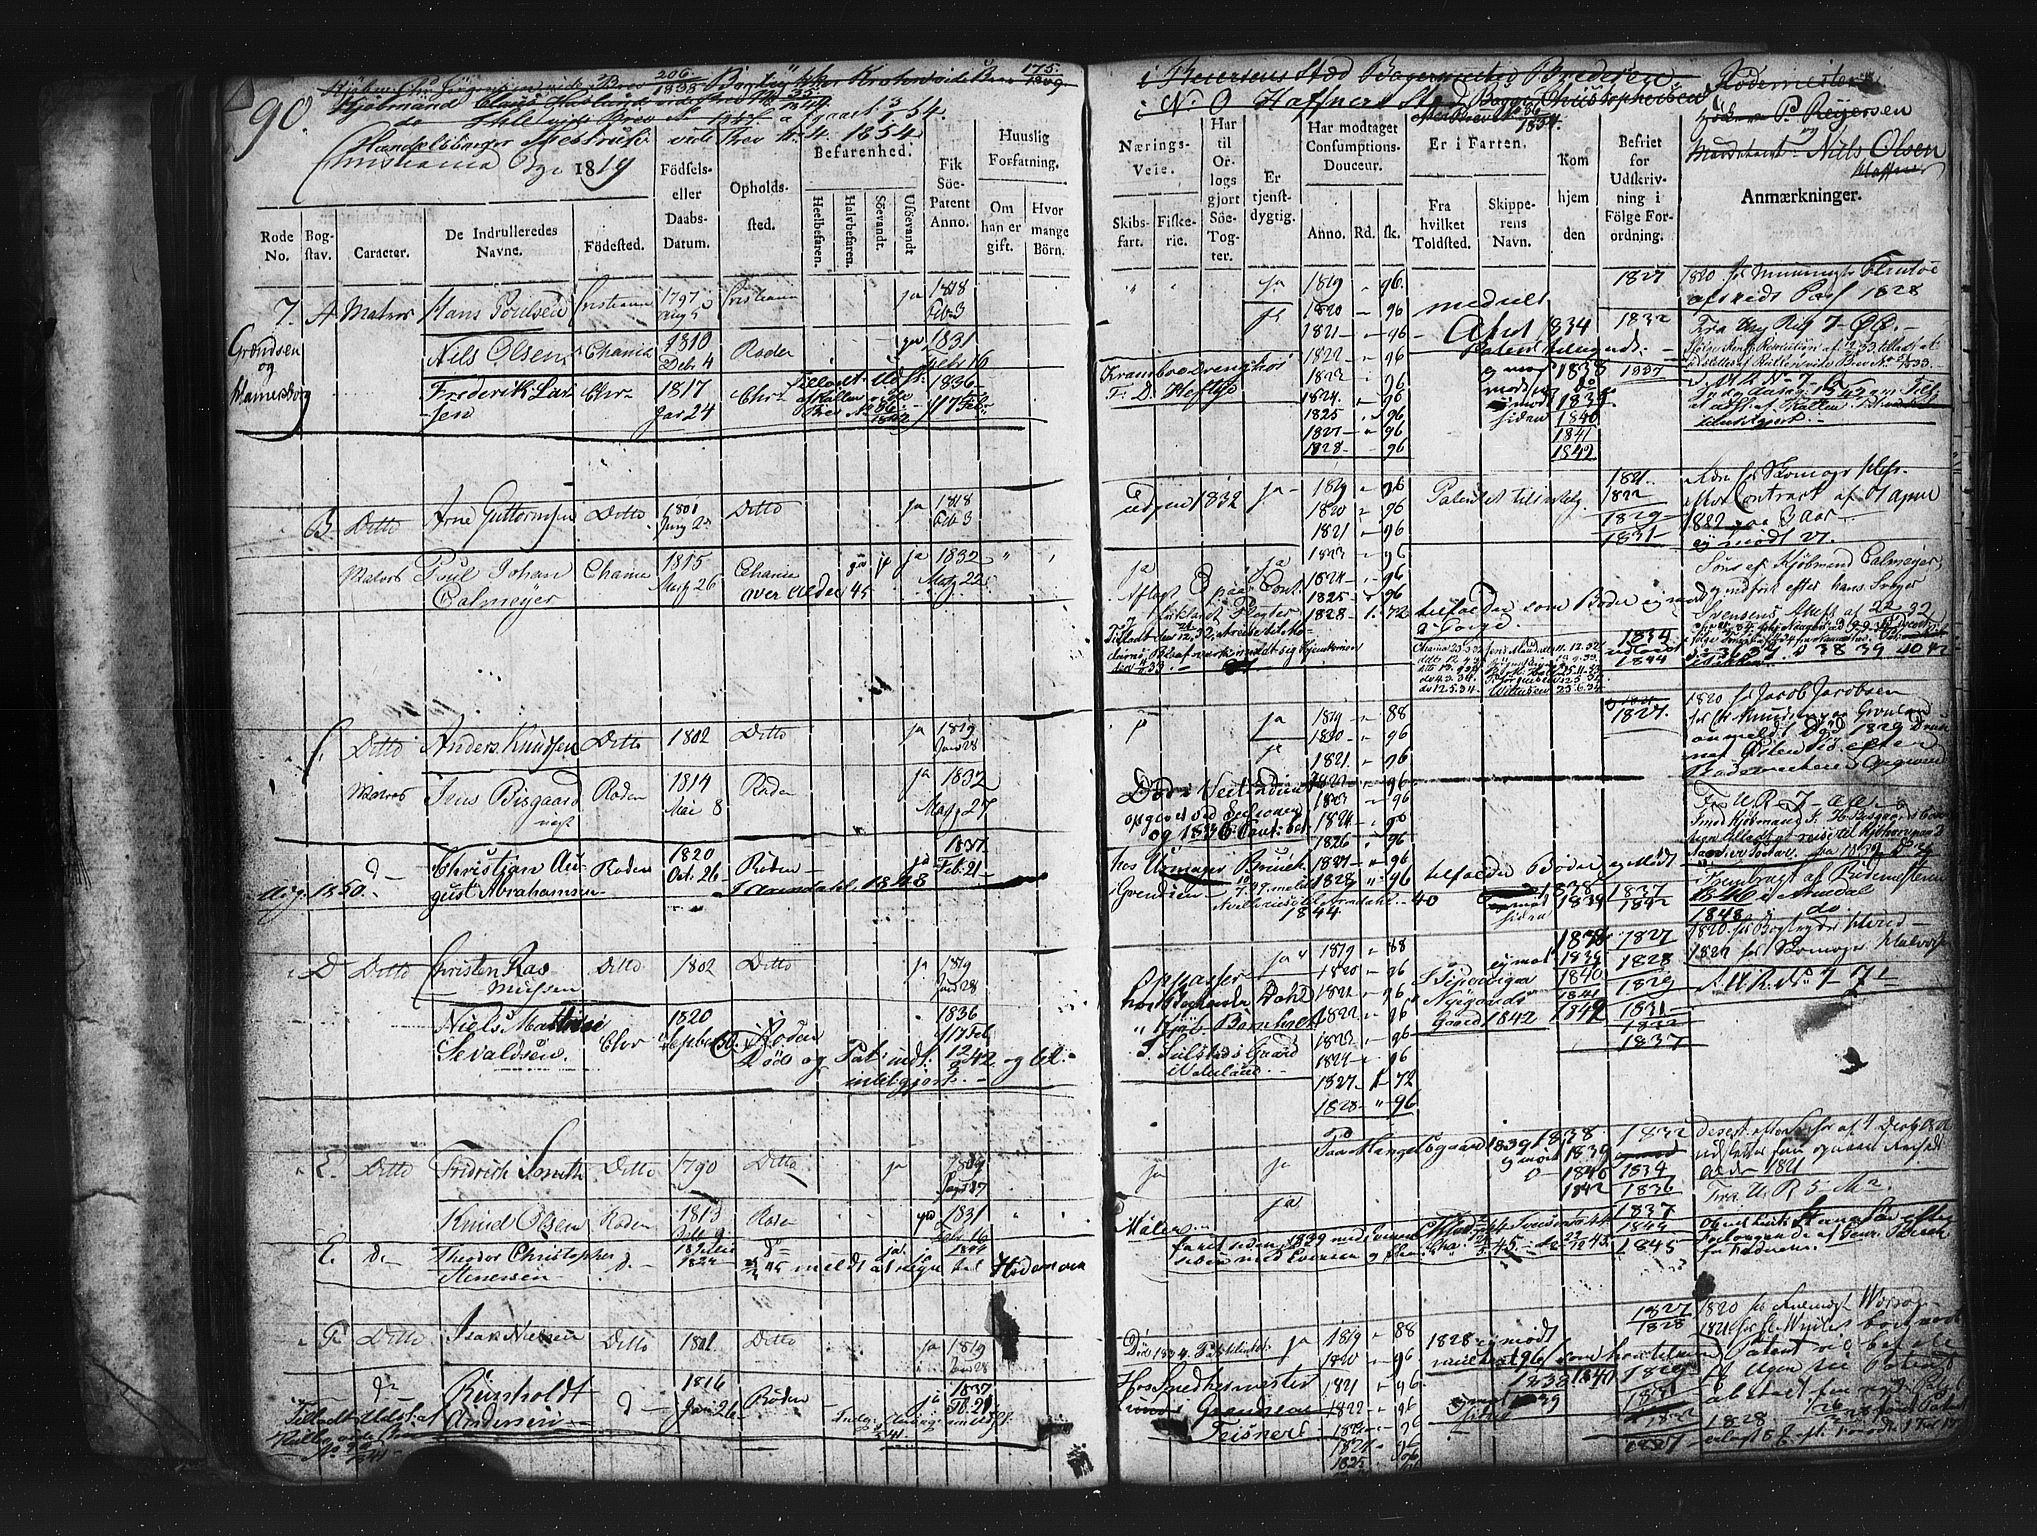 SAO, Oslo mønstringskontor, F/Fc/Fcb/L0001: Hovedrulle, 1819, s. 90